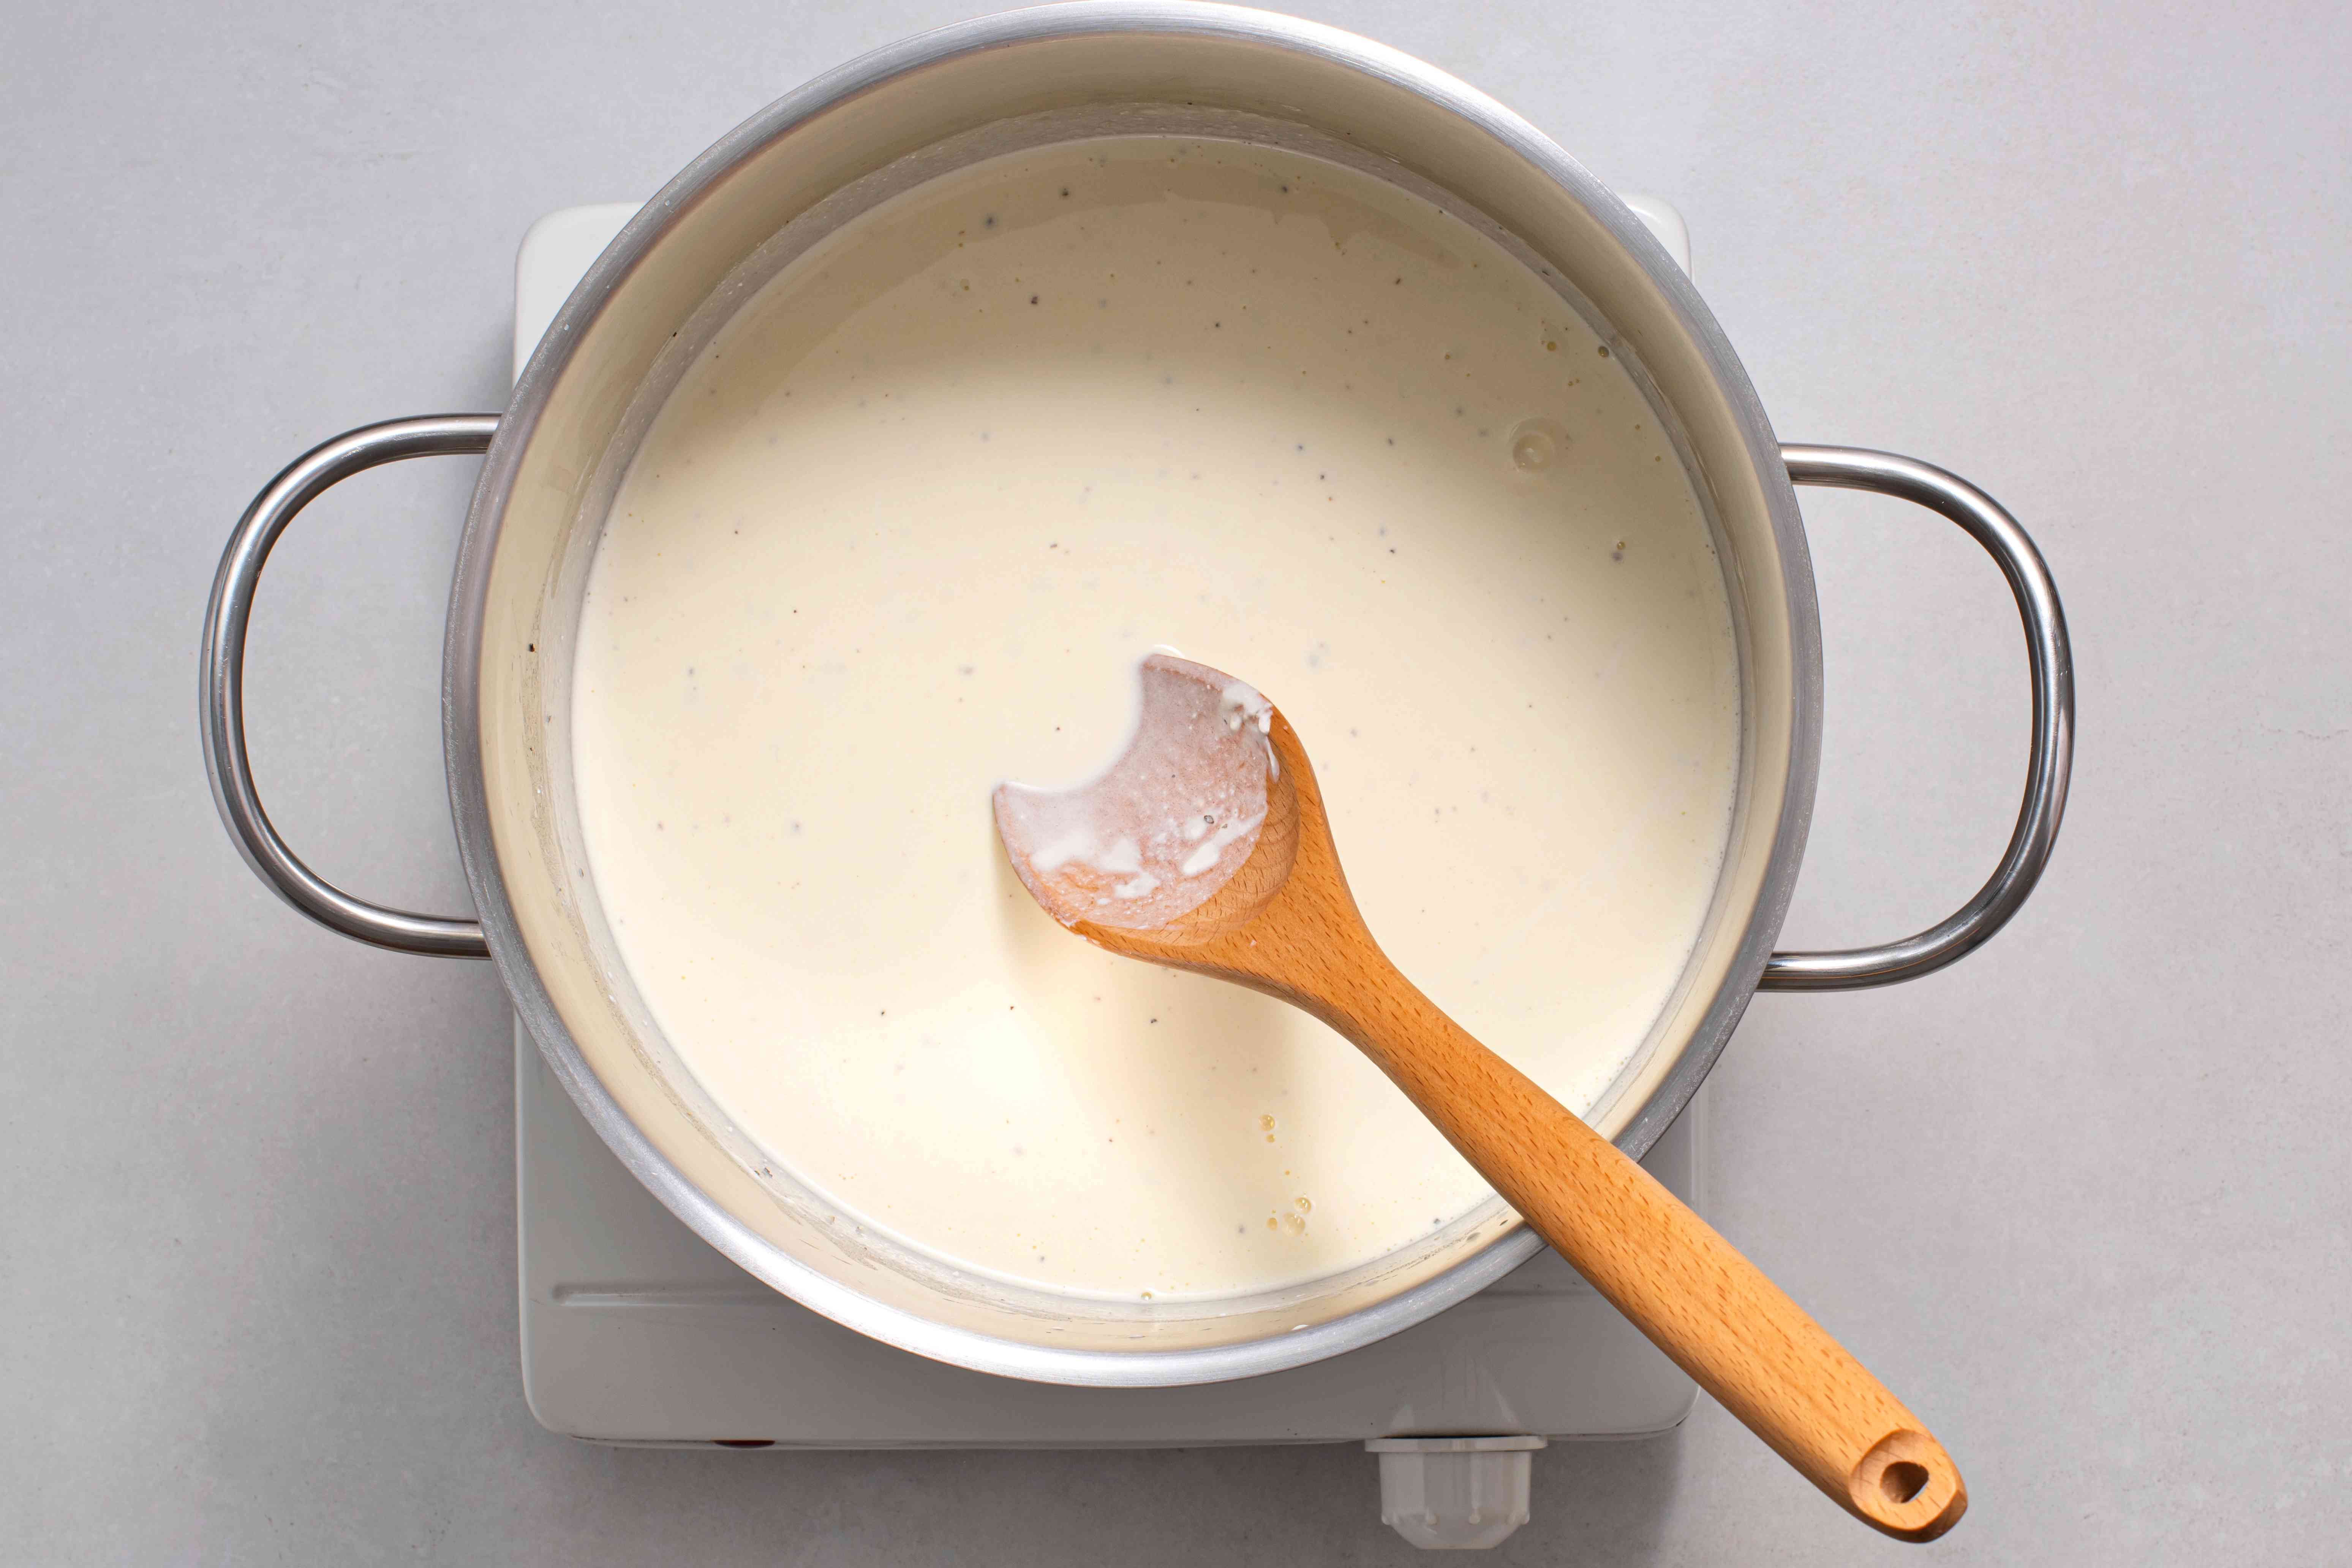 cream mixture in a pot